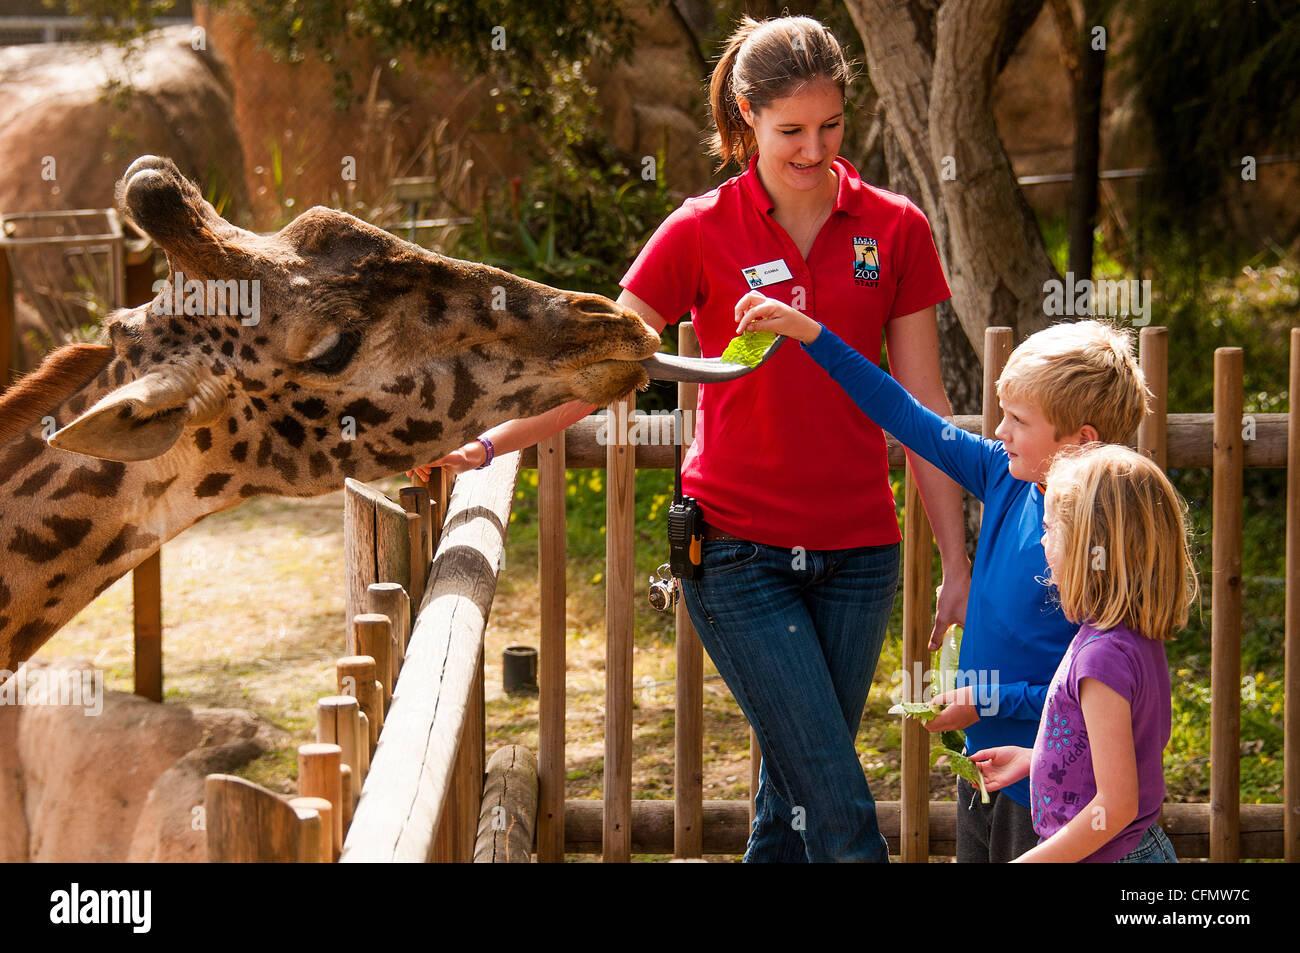 Children feed giraffe at Santa Barbara Zoo central California Coast USA - Stock Image